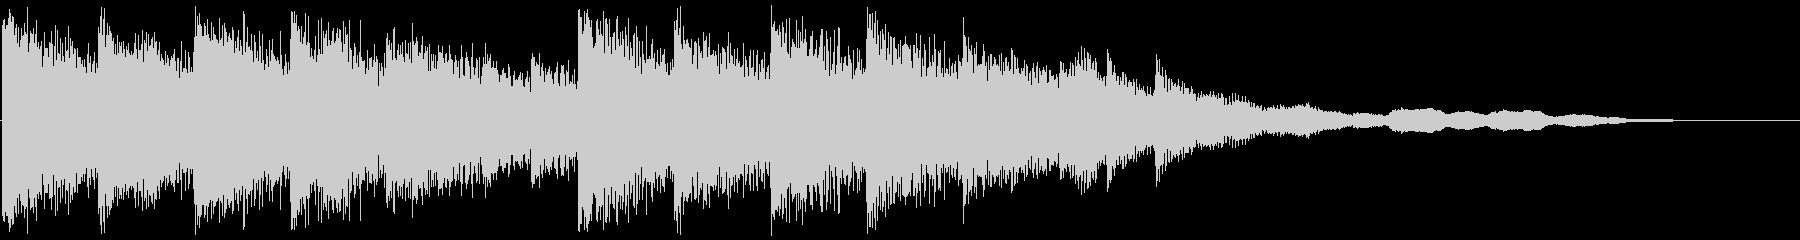 Cute fluffy synth jingle's unreproduced waveform